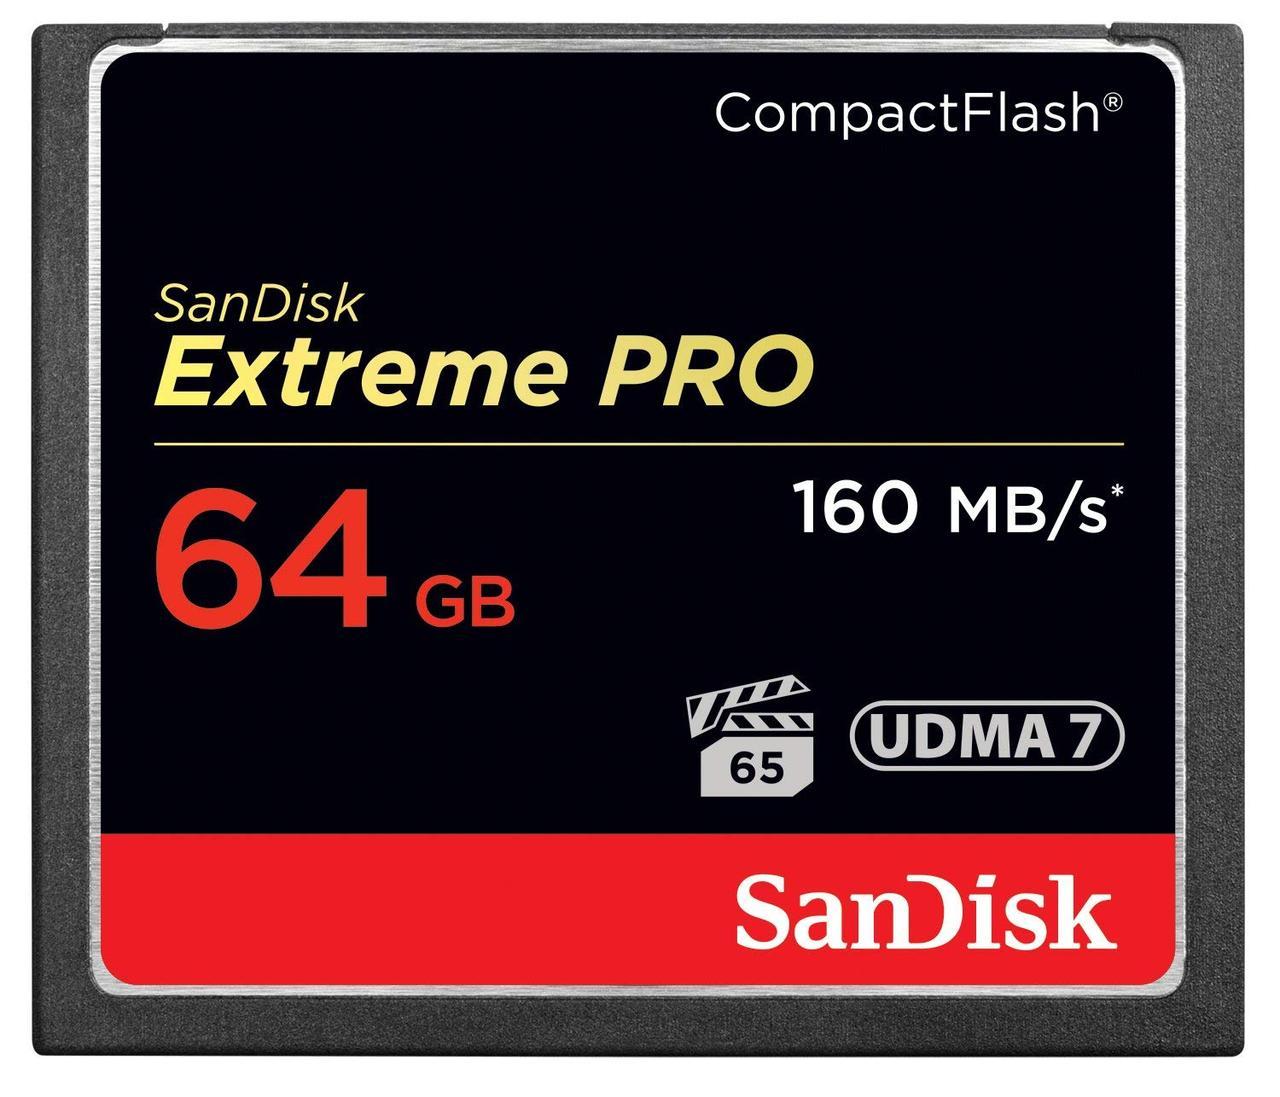 SanDisk Extreme PRO 64GB /ОРИГИНАЛ!/ CompactFlash карта памяти UDMA 7 скорость до 160MB